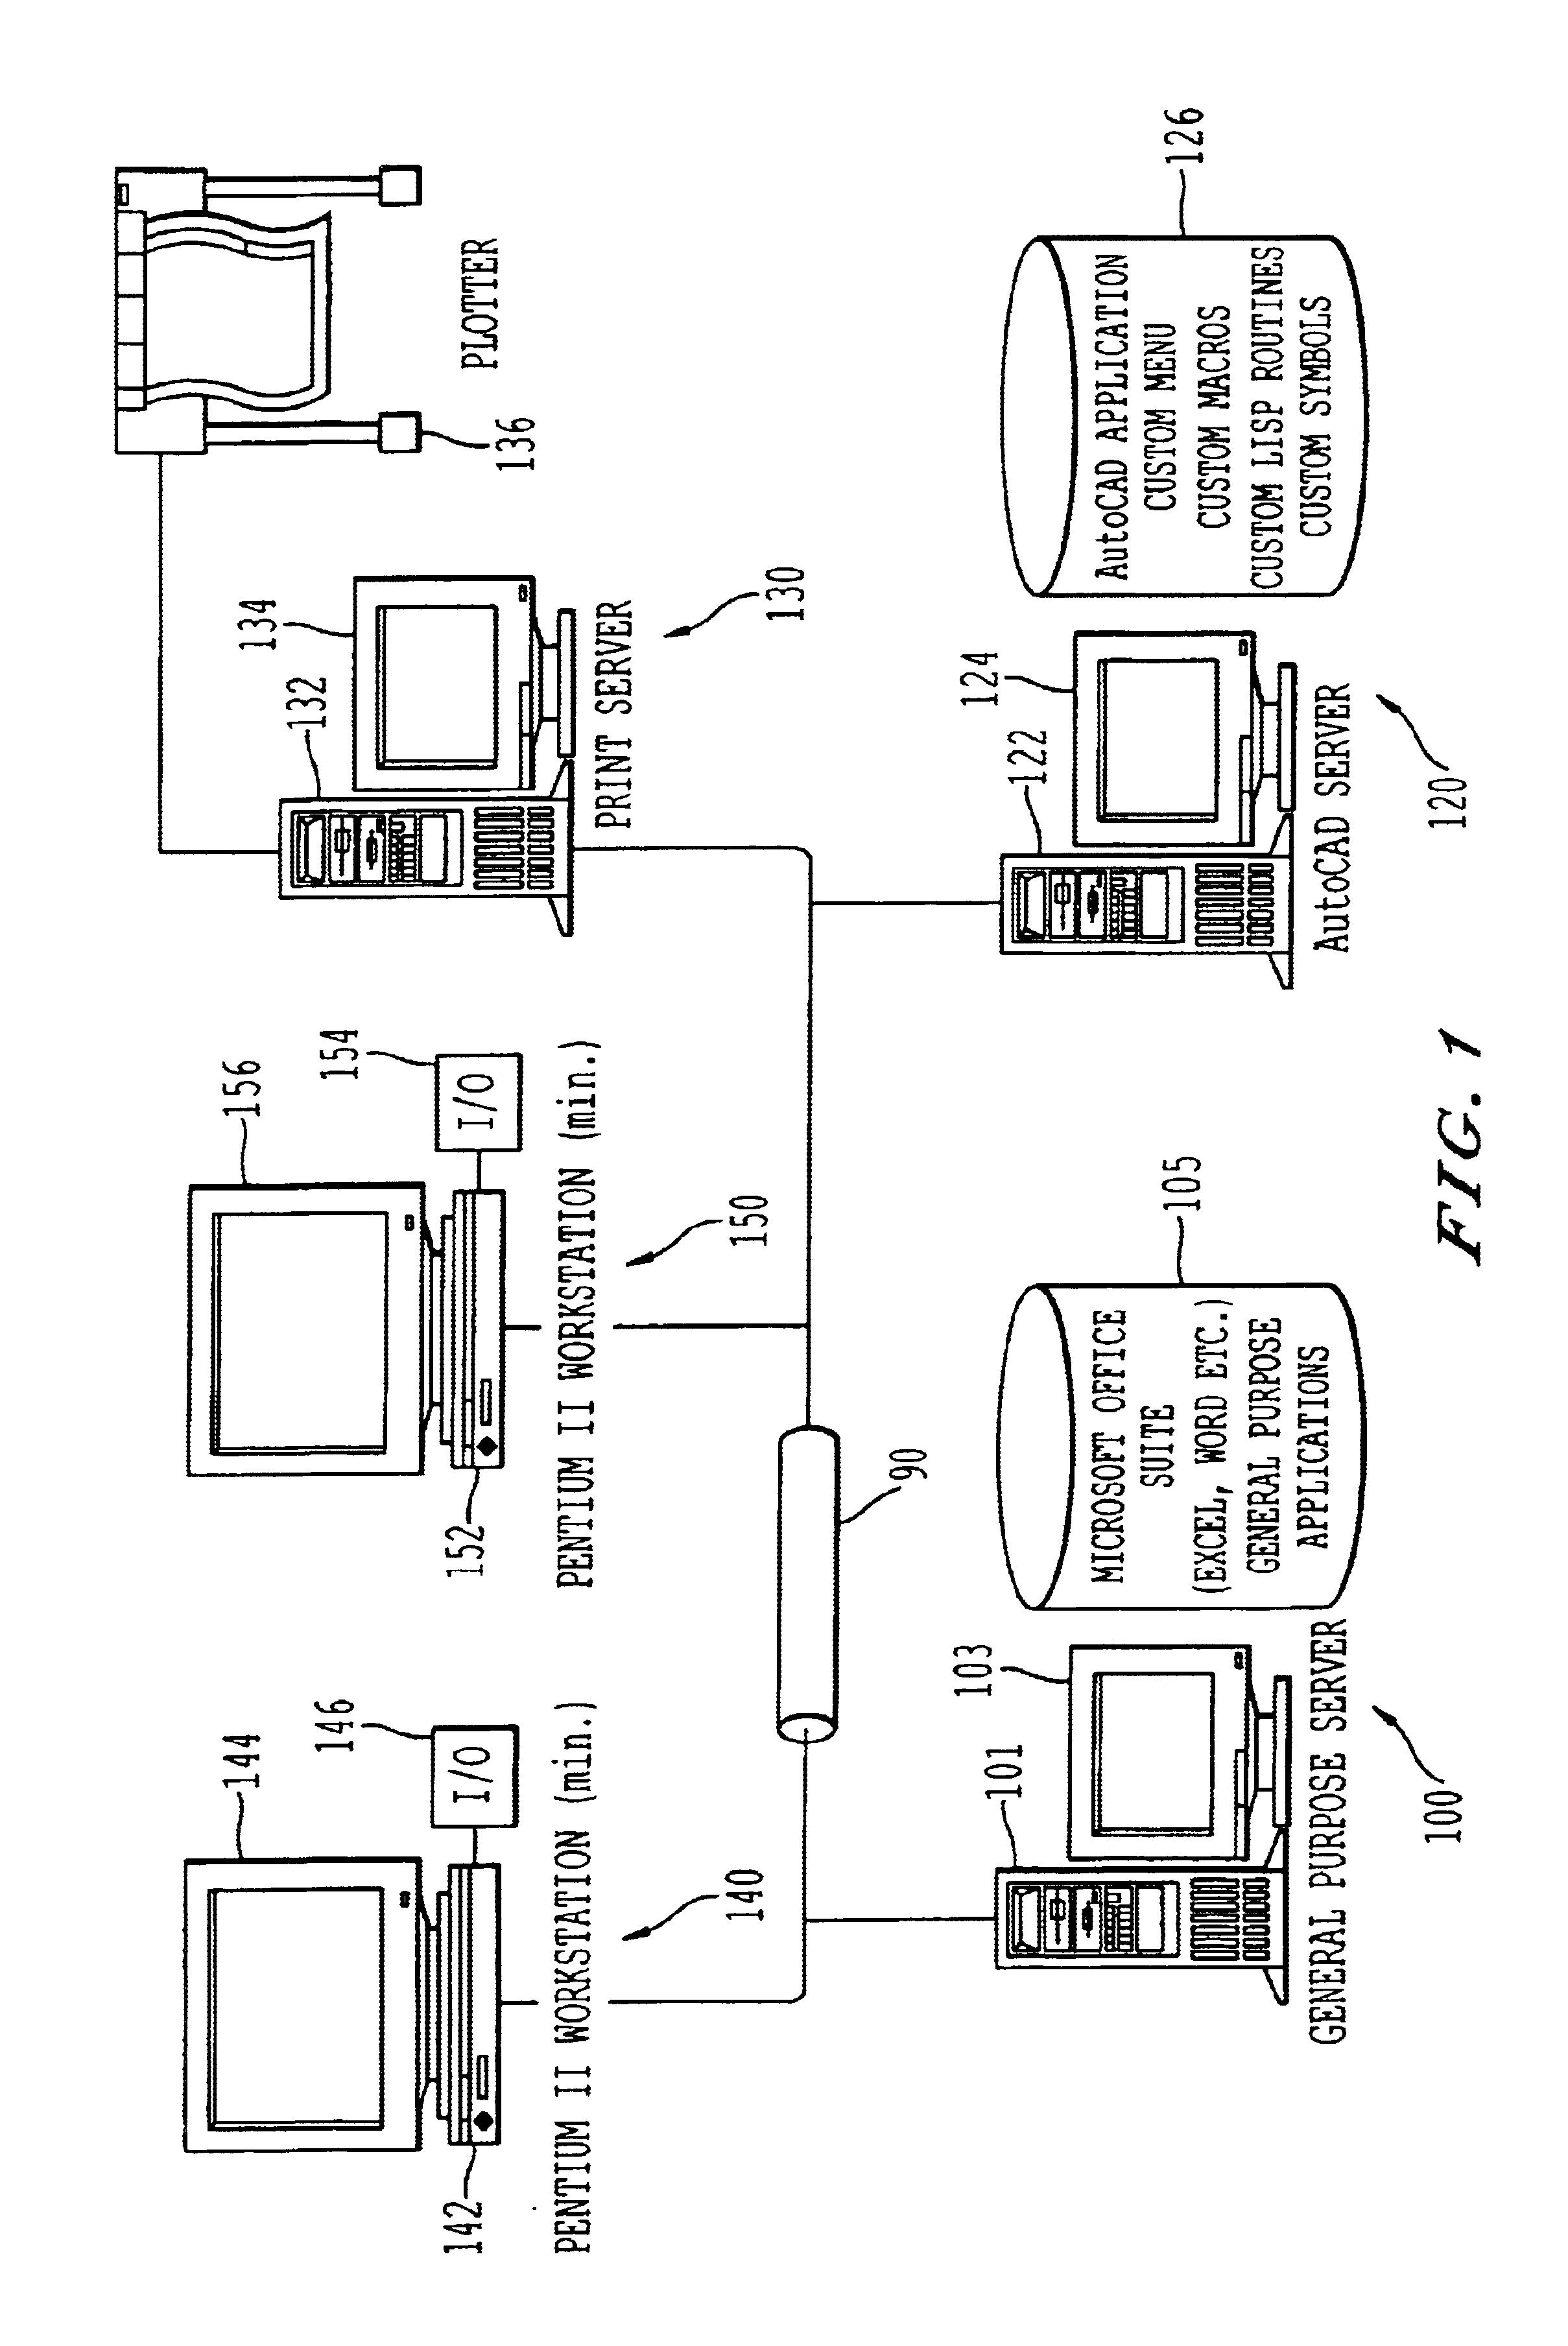 wiring diagram substation honda motorcycle stator electrical symbols engine and